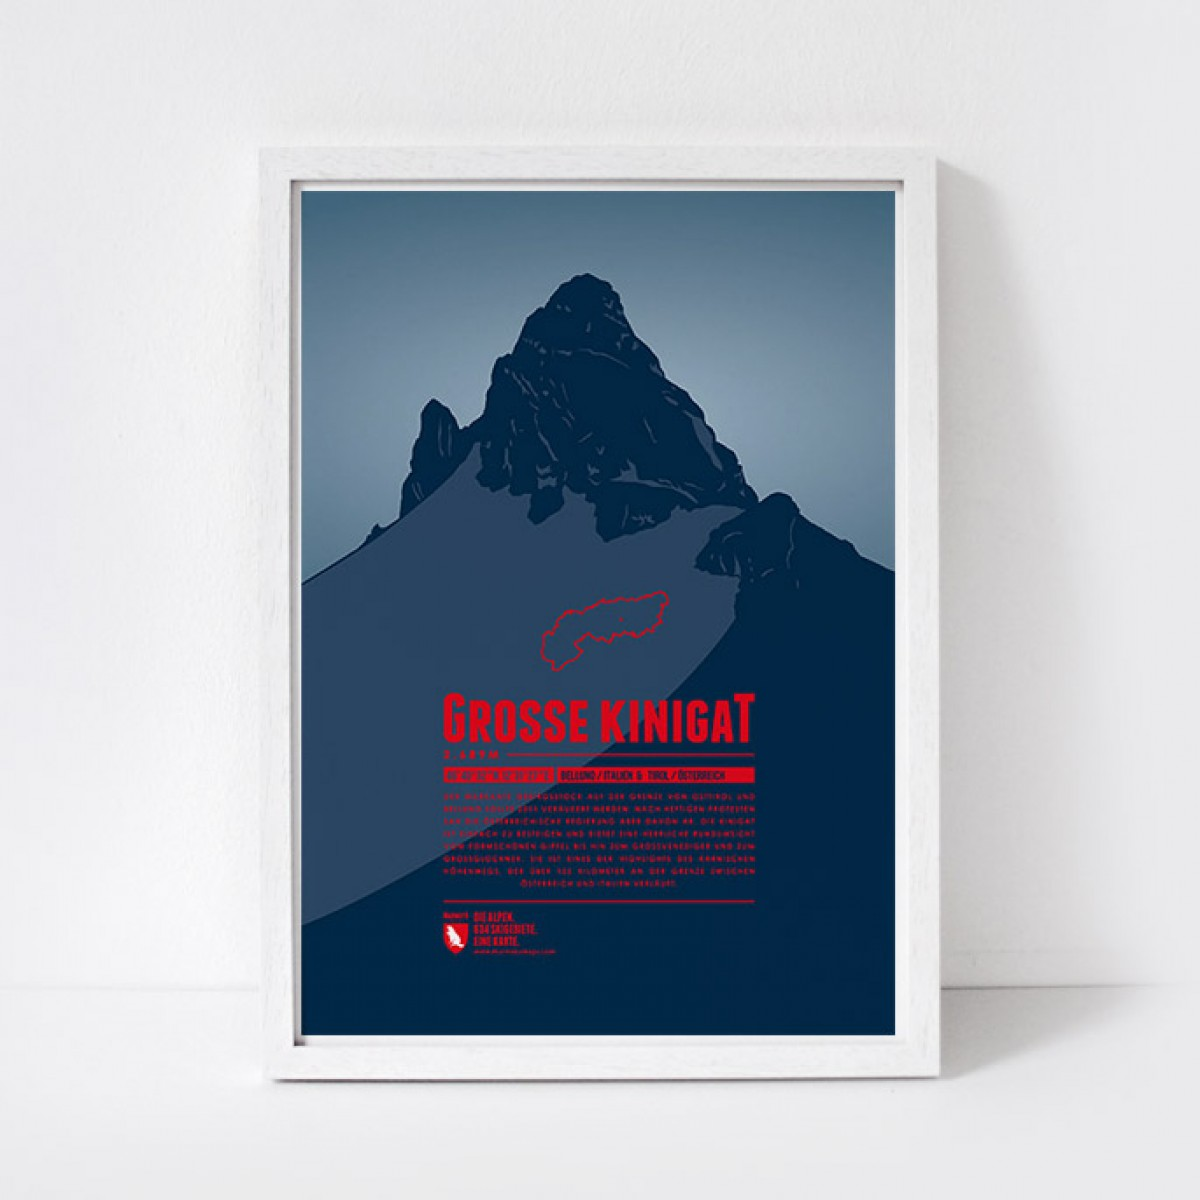 Marmota Maps – Große Kinigat  - Bergdruck